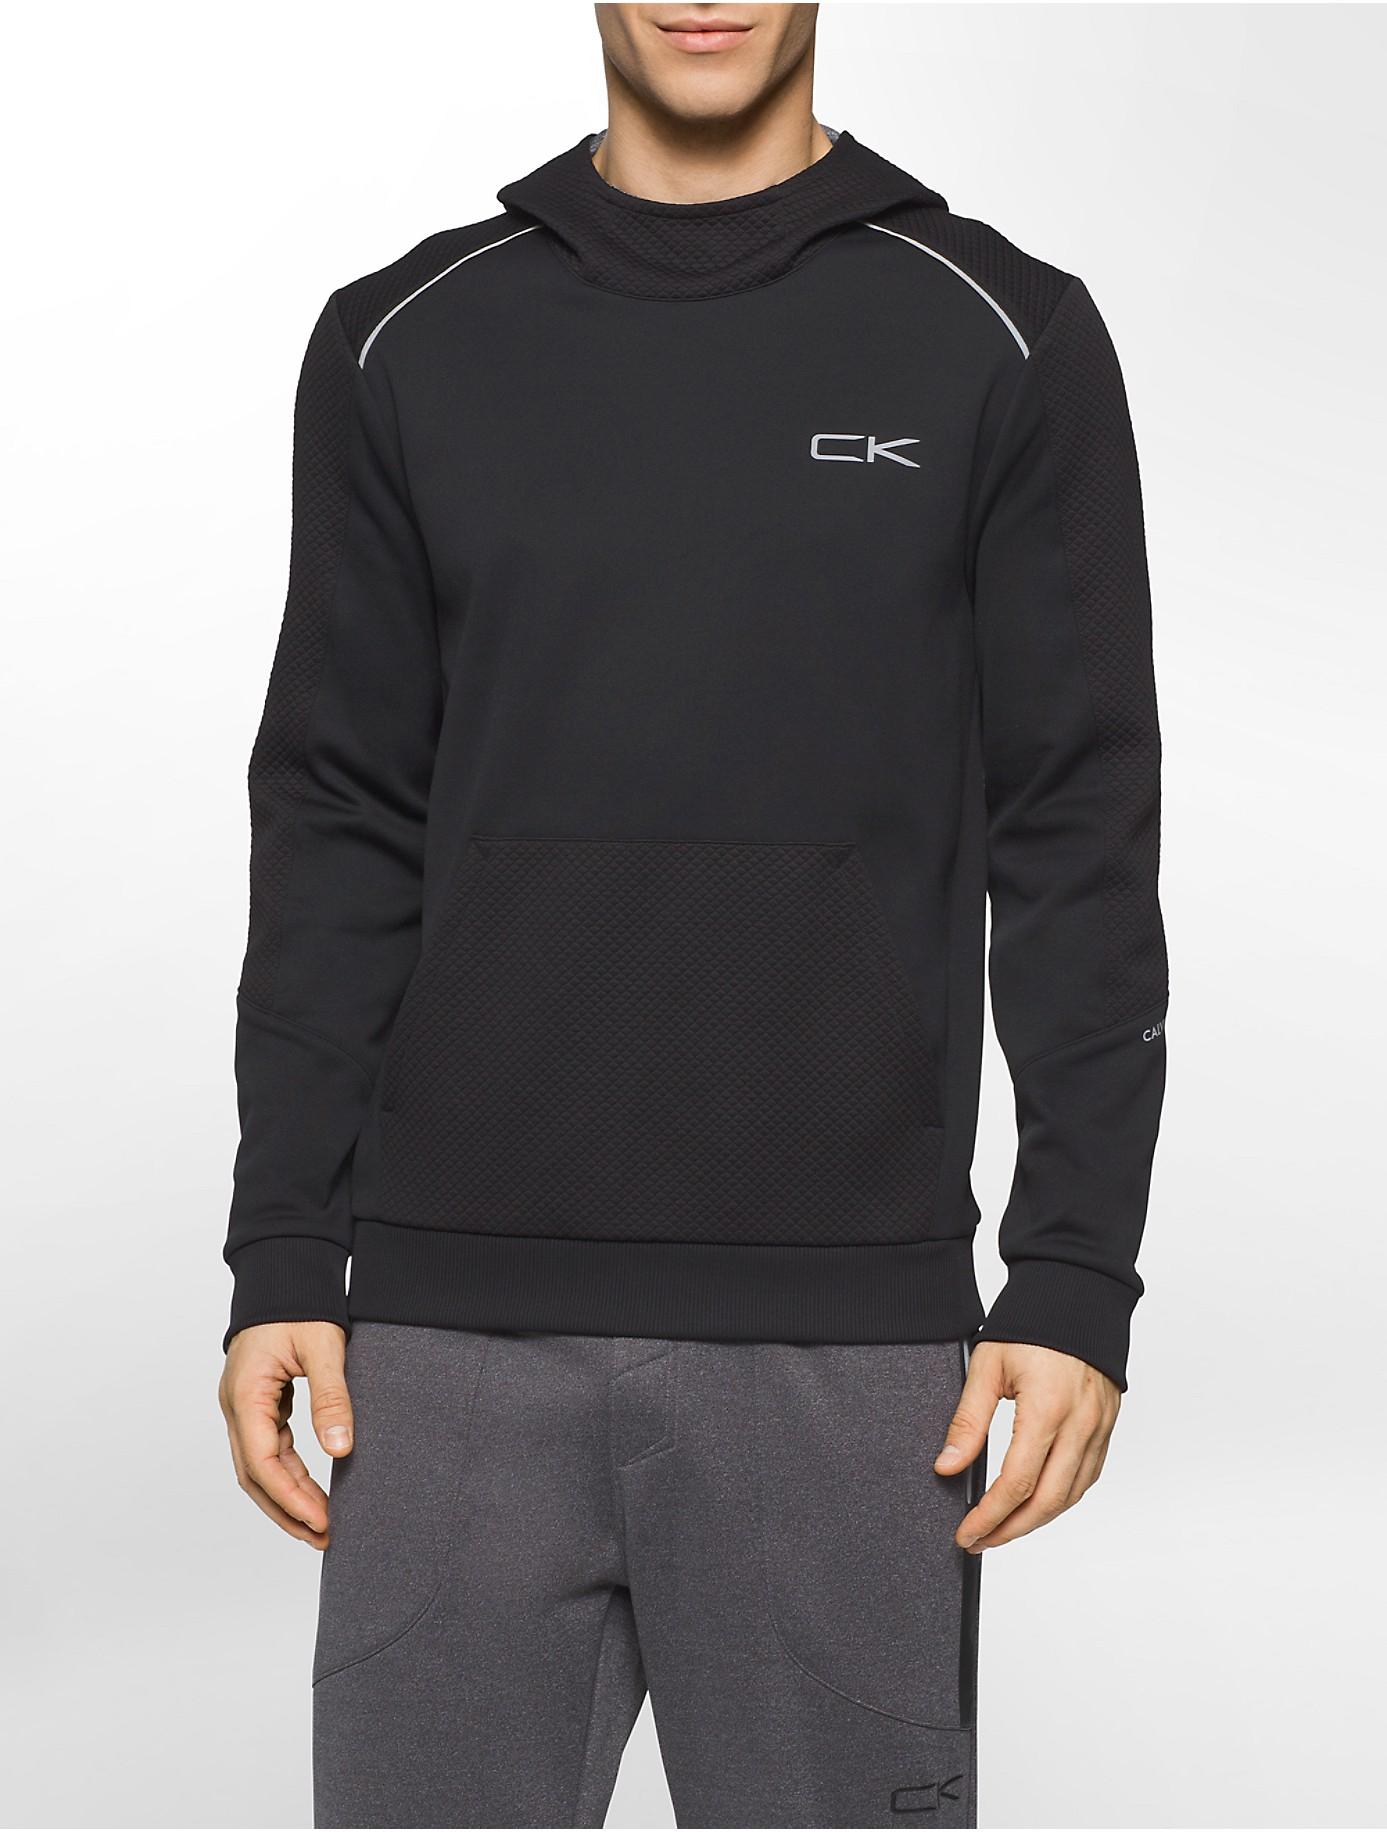 calvin klein performance textured fleece hoodie in black for men lyst. Black Bedroom Furniture Sets. Home Design Ideas